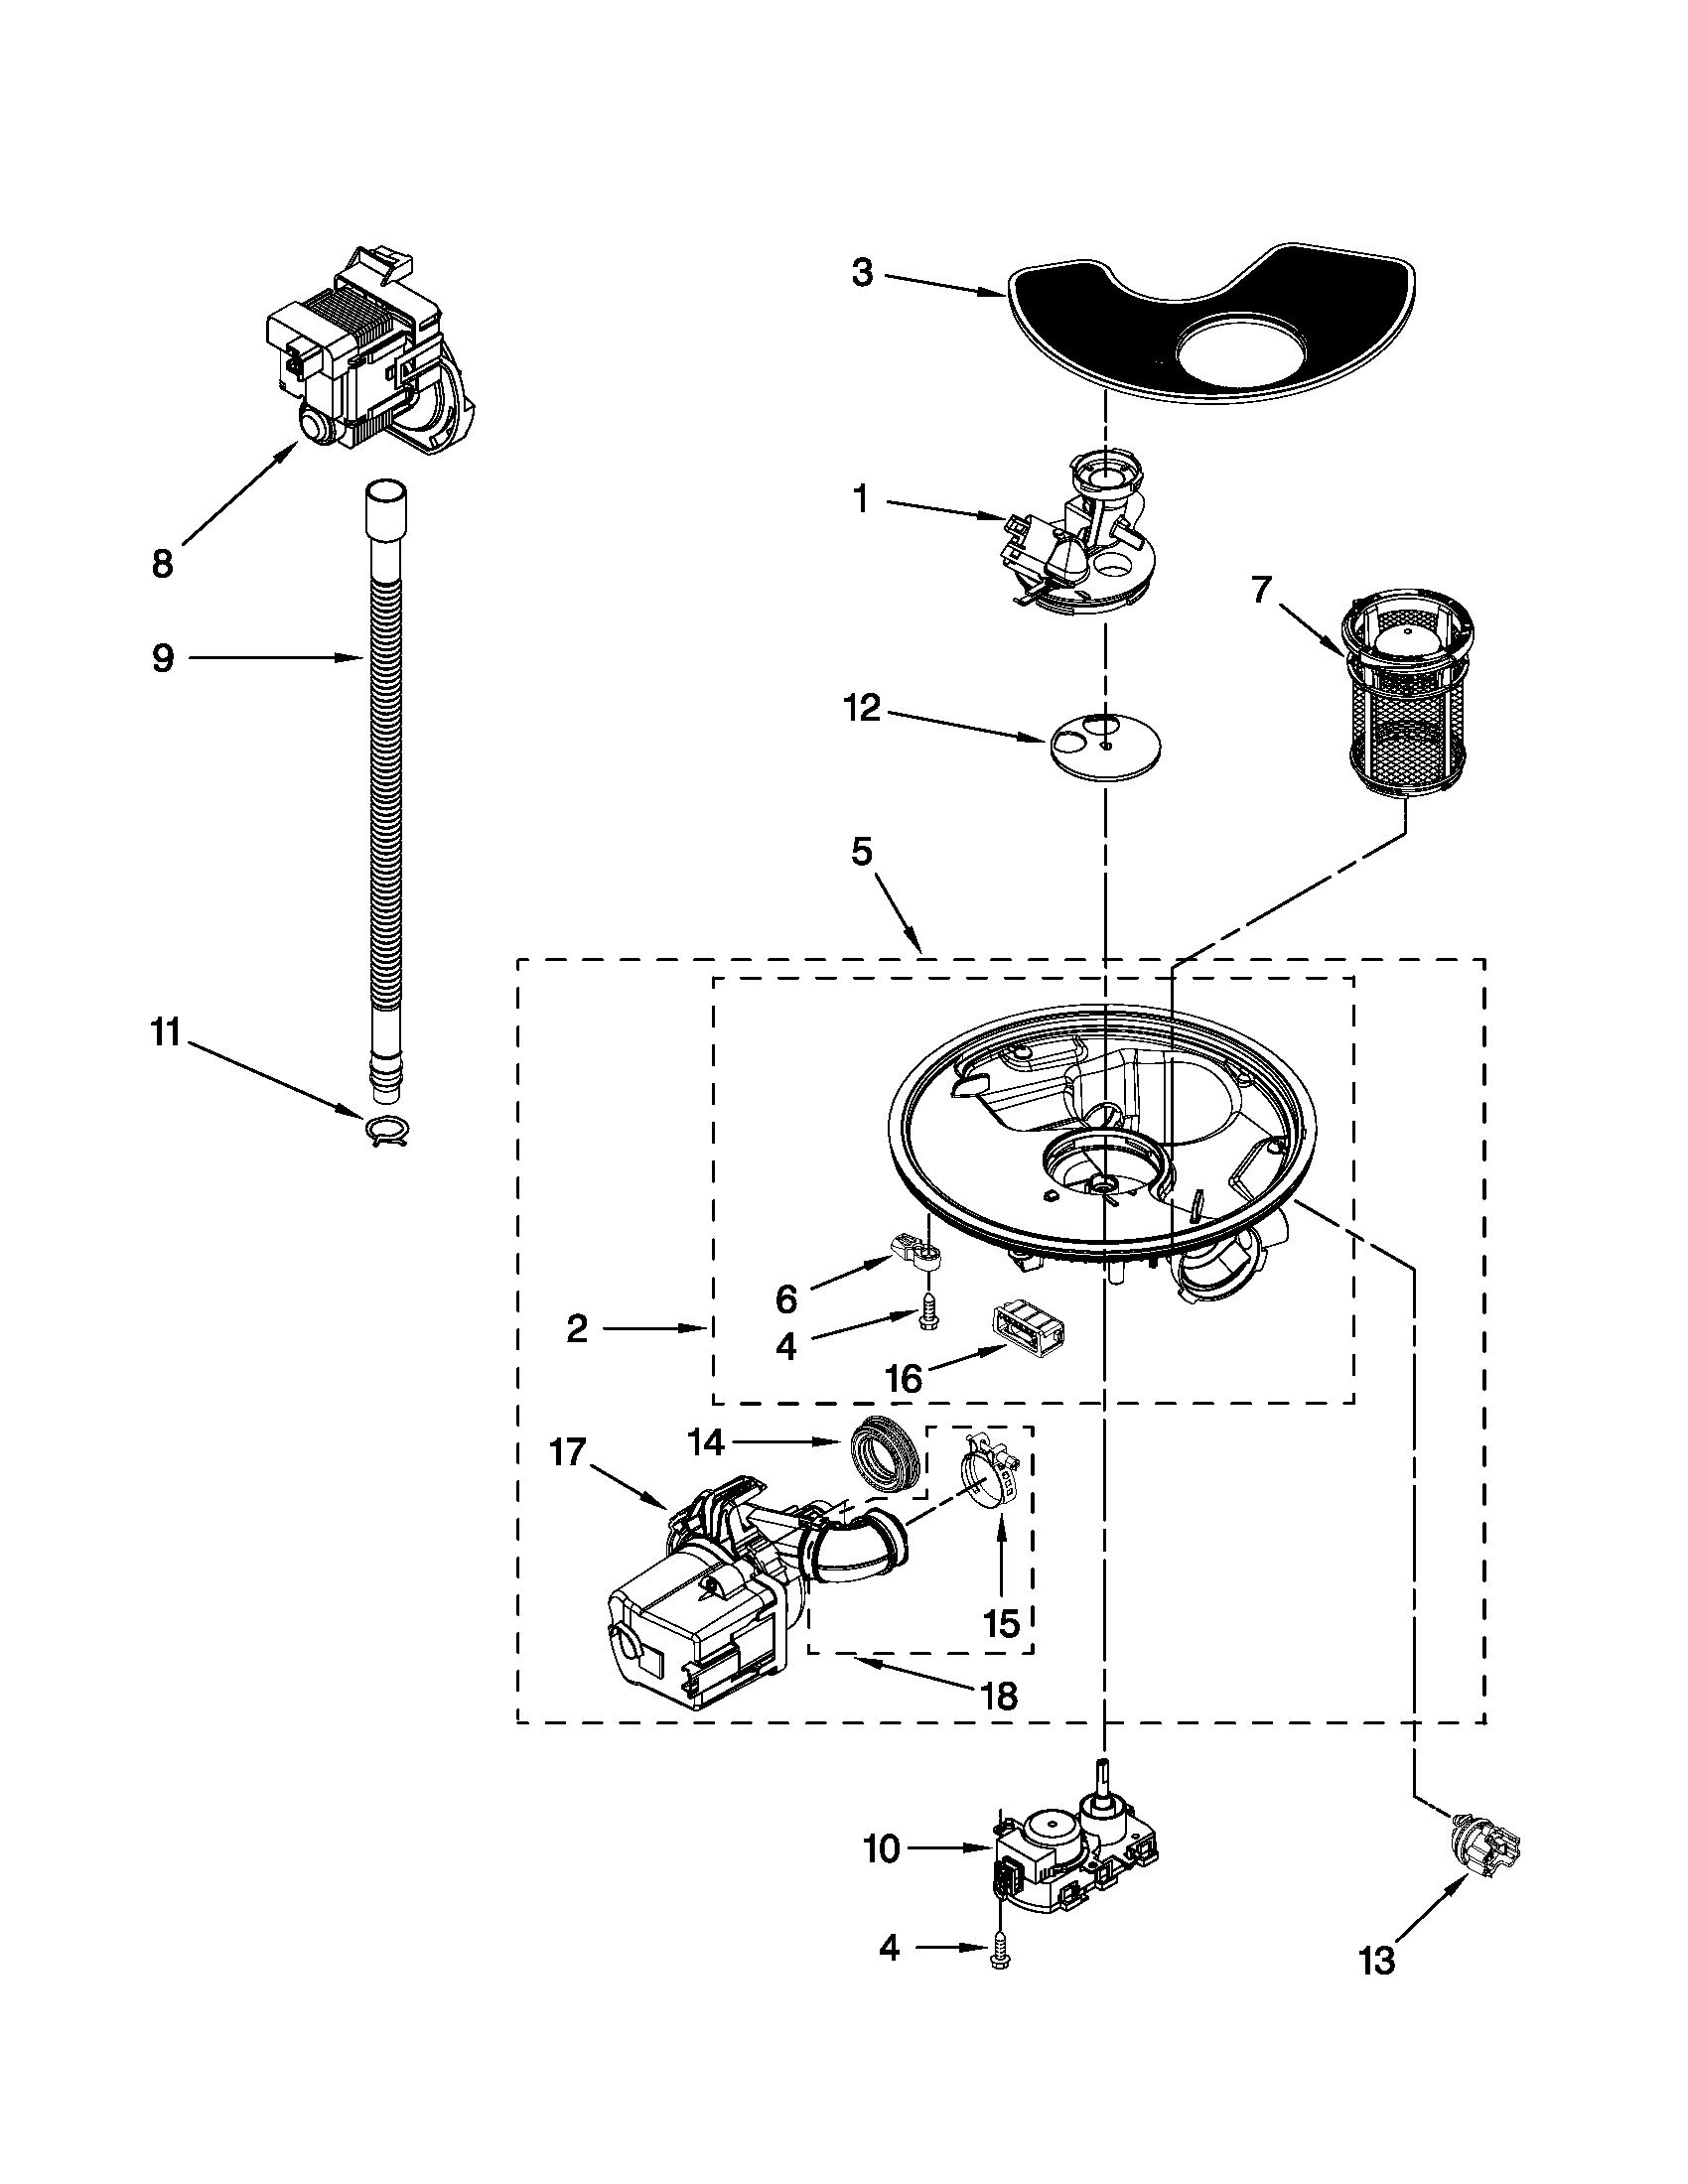 PUMP AND MOTOR PARTS Diagram & Parts List for Model